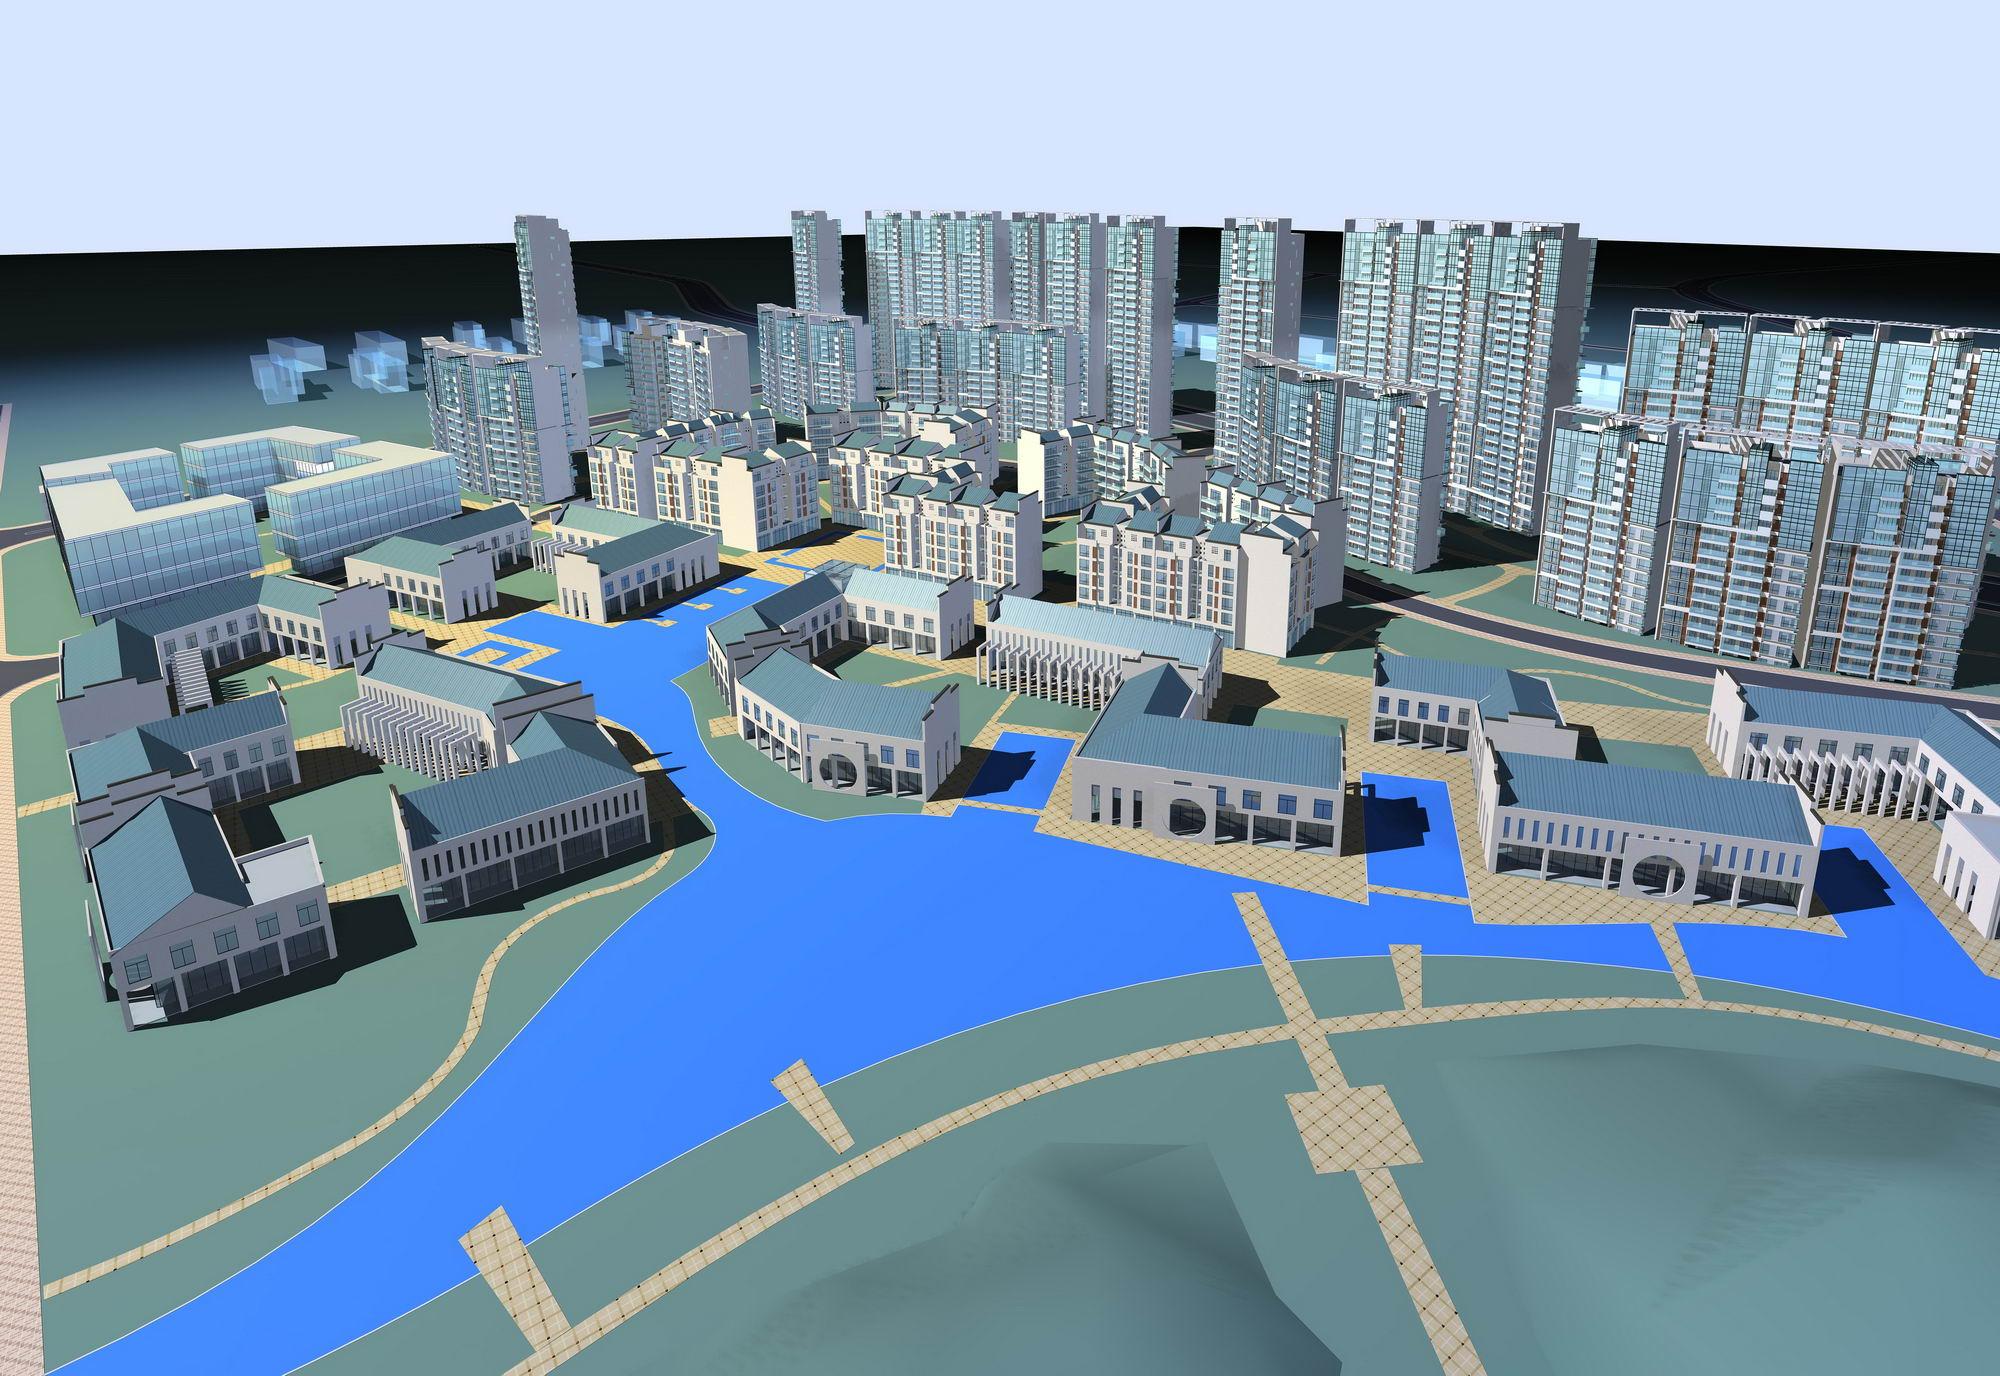 urbani dizajn 102 3d model max psd 121470